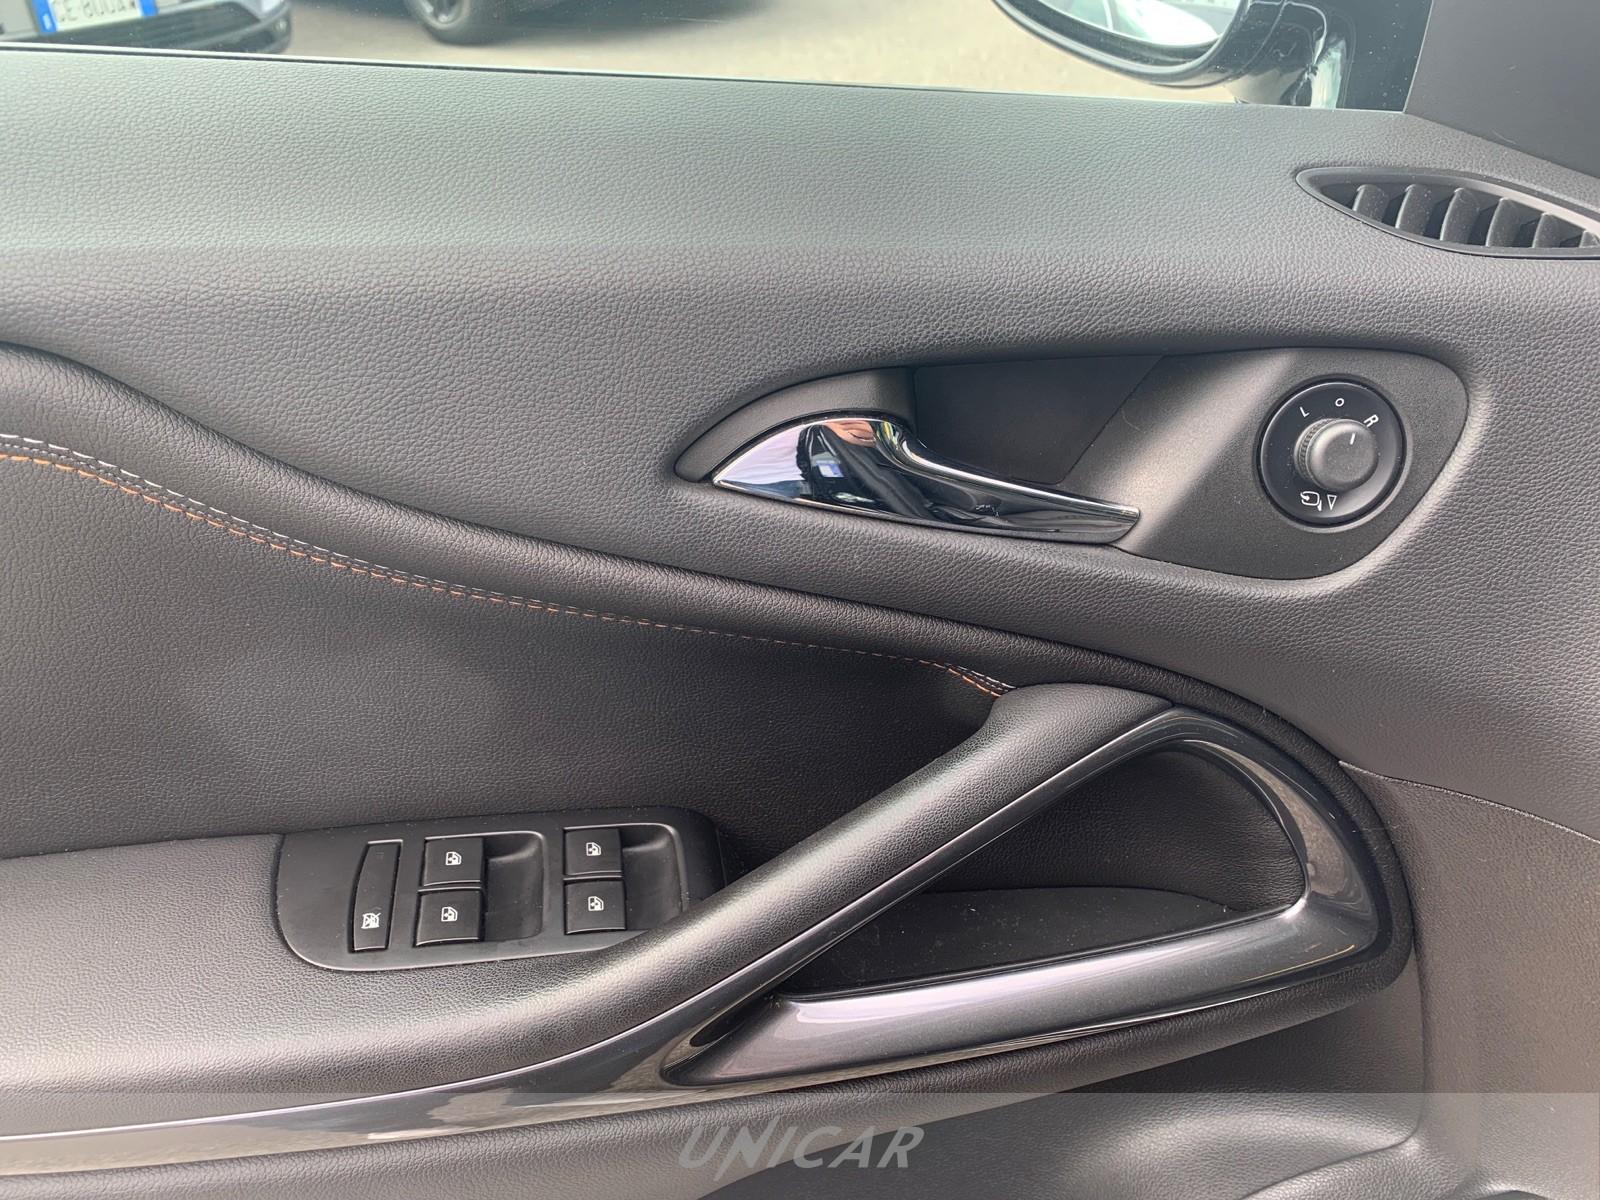 UNICAR Opel Zafira Tourer